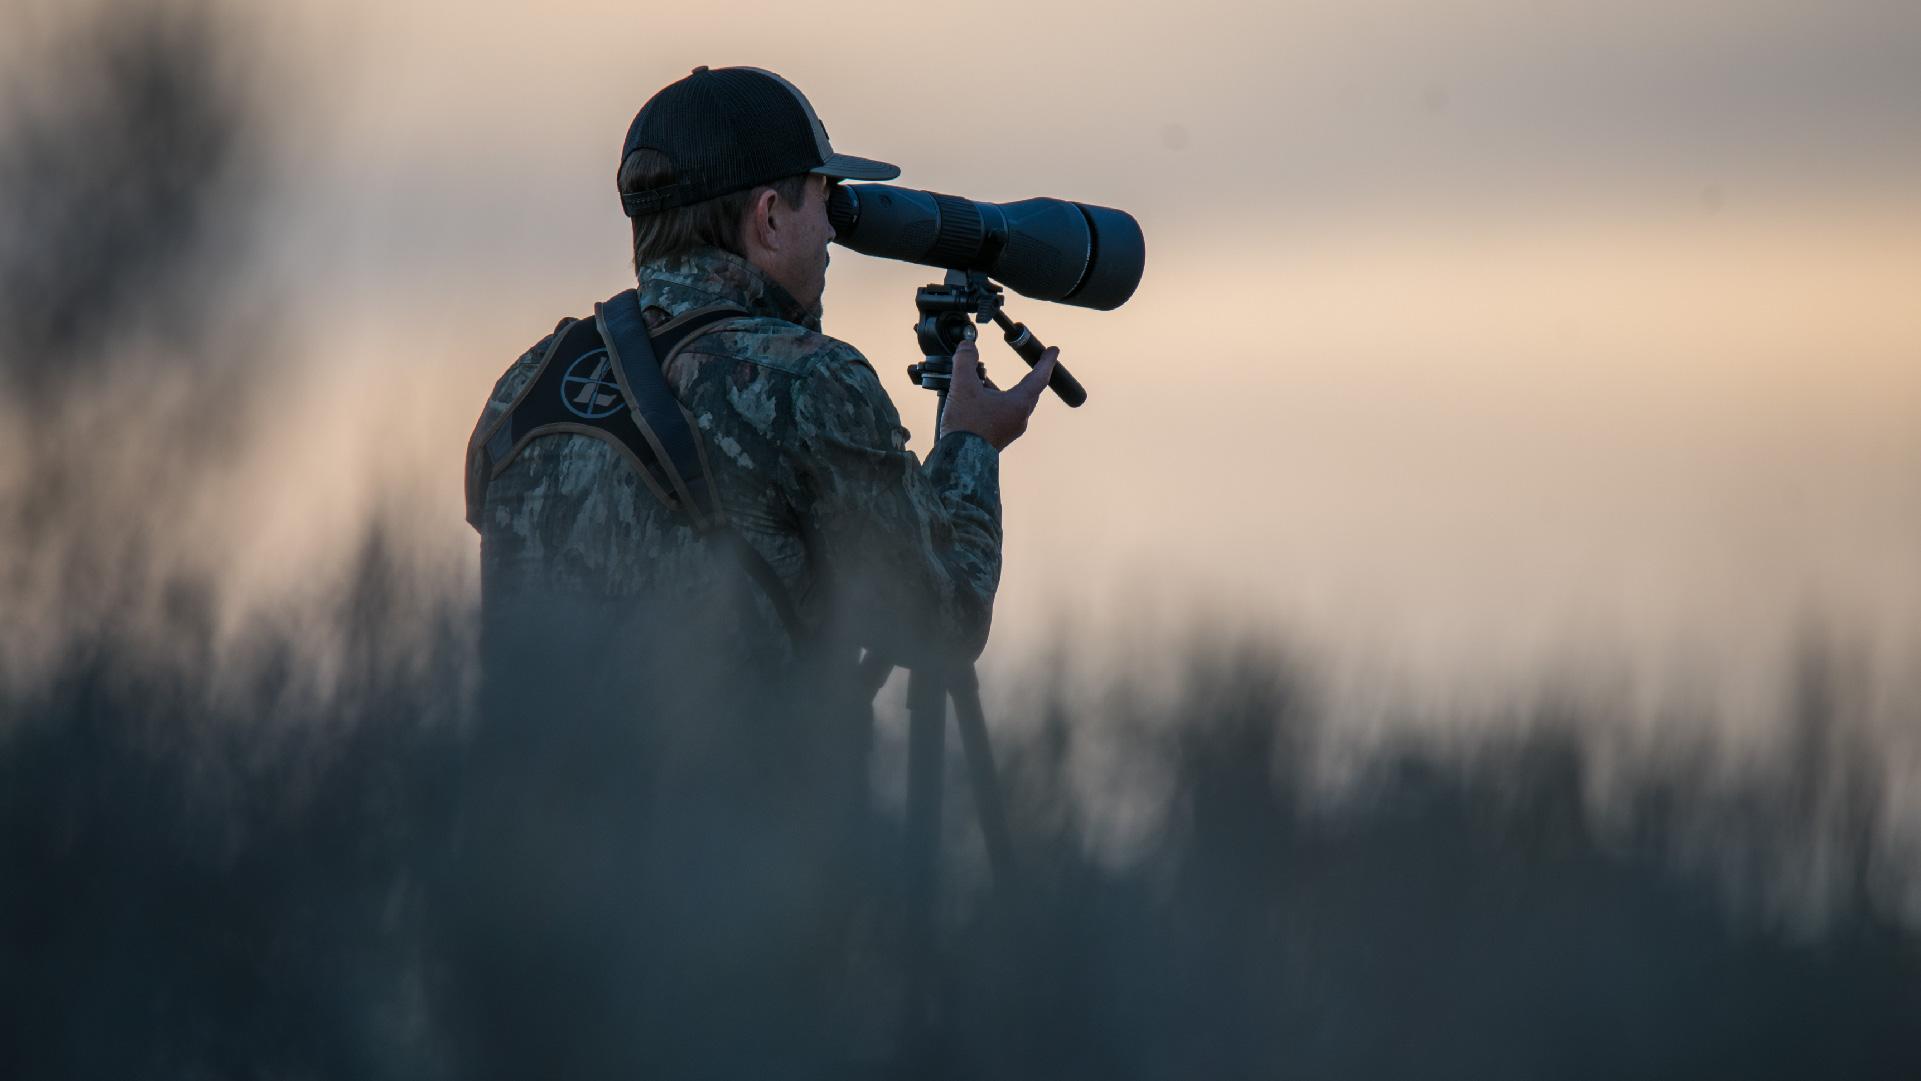 Hunter glasses through Leupold spotting scope.